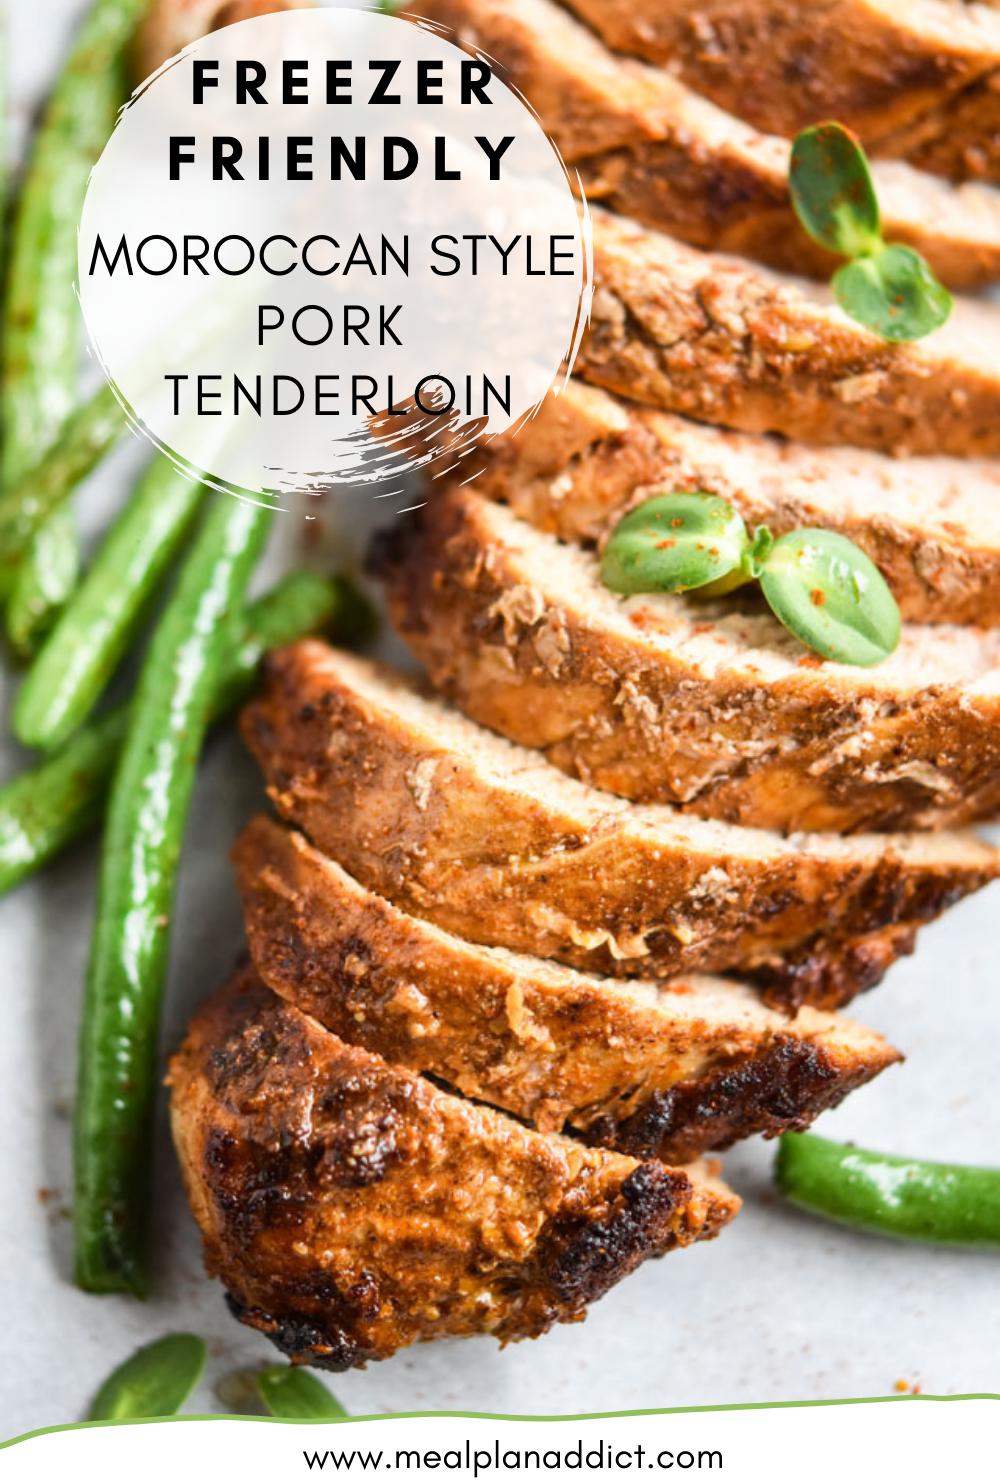 Freezer Friendly Moroccan Style Pork Tenderloin